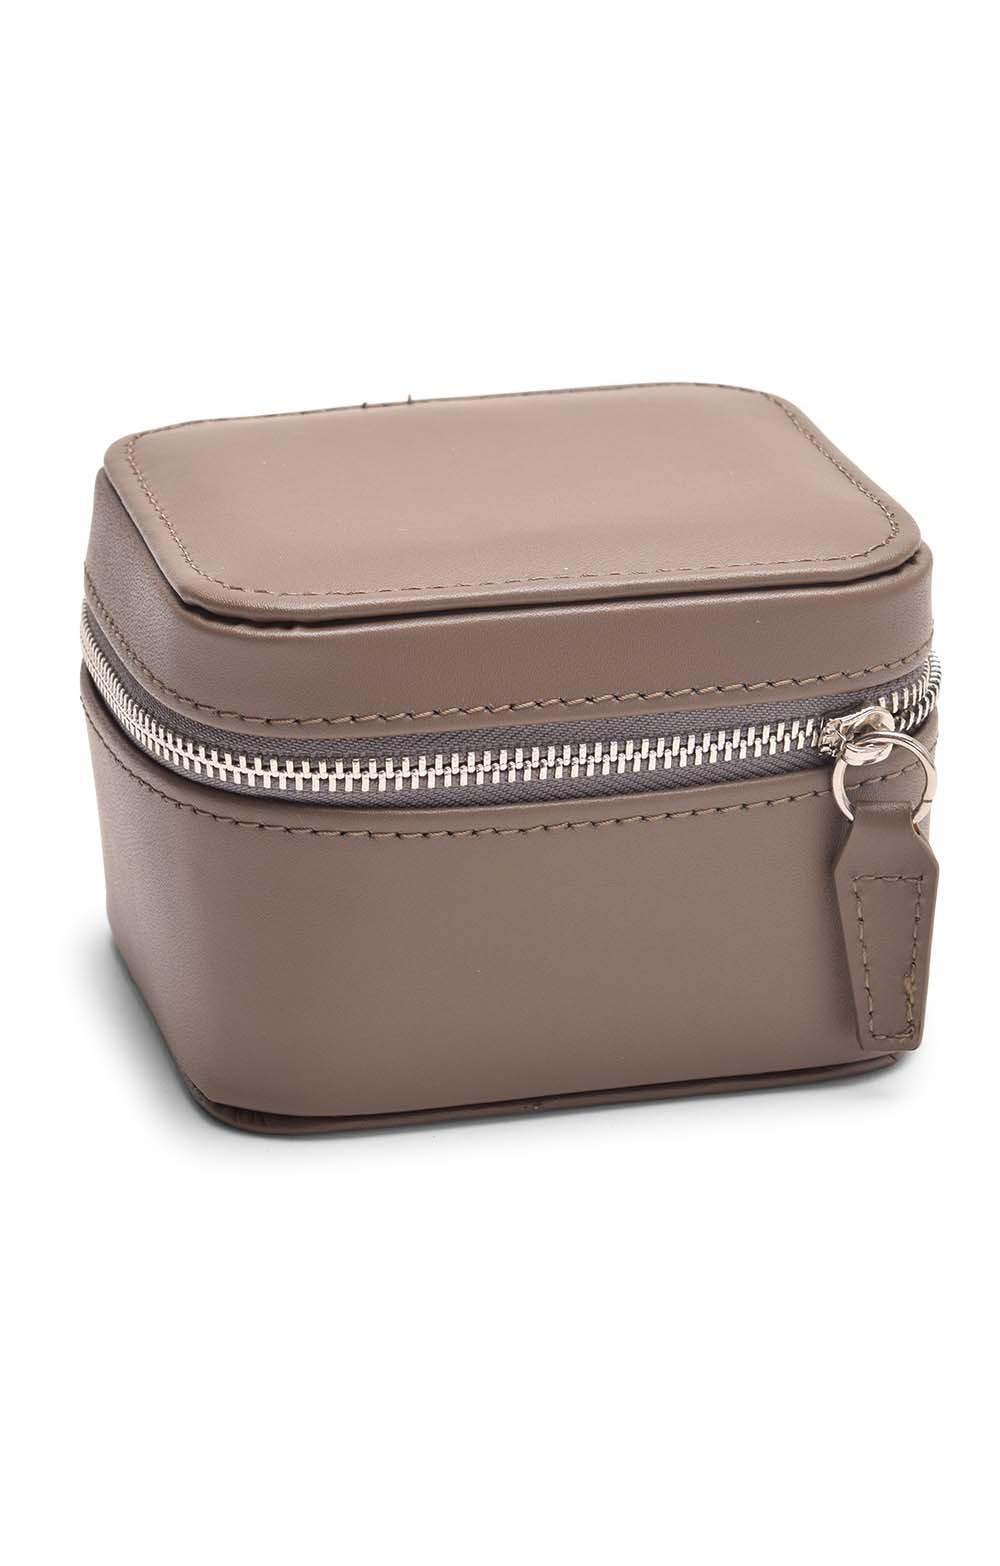 Leather Square Travel Jewellery Box